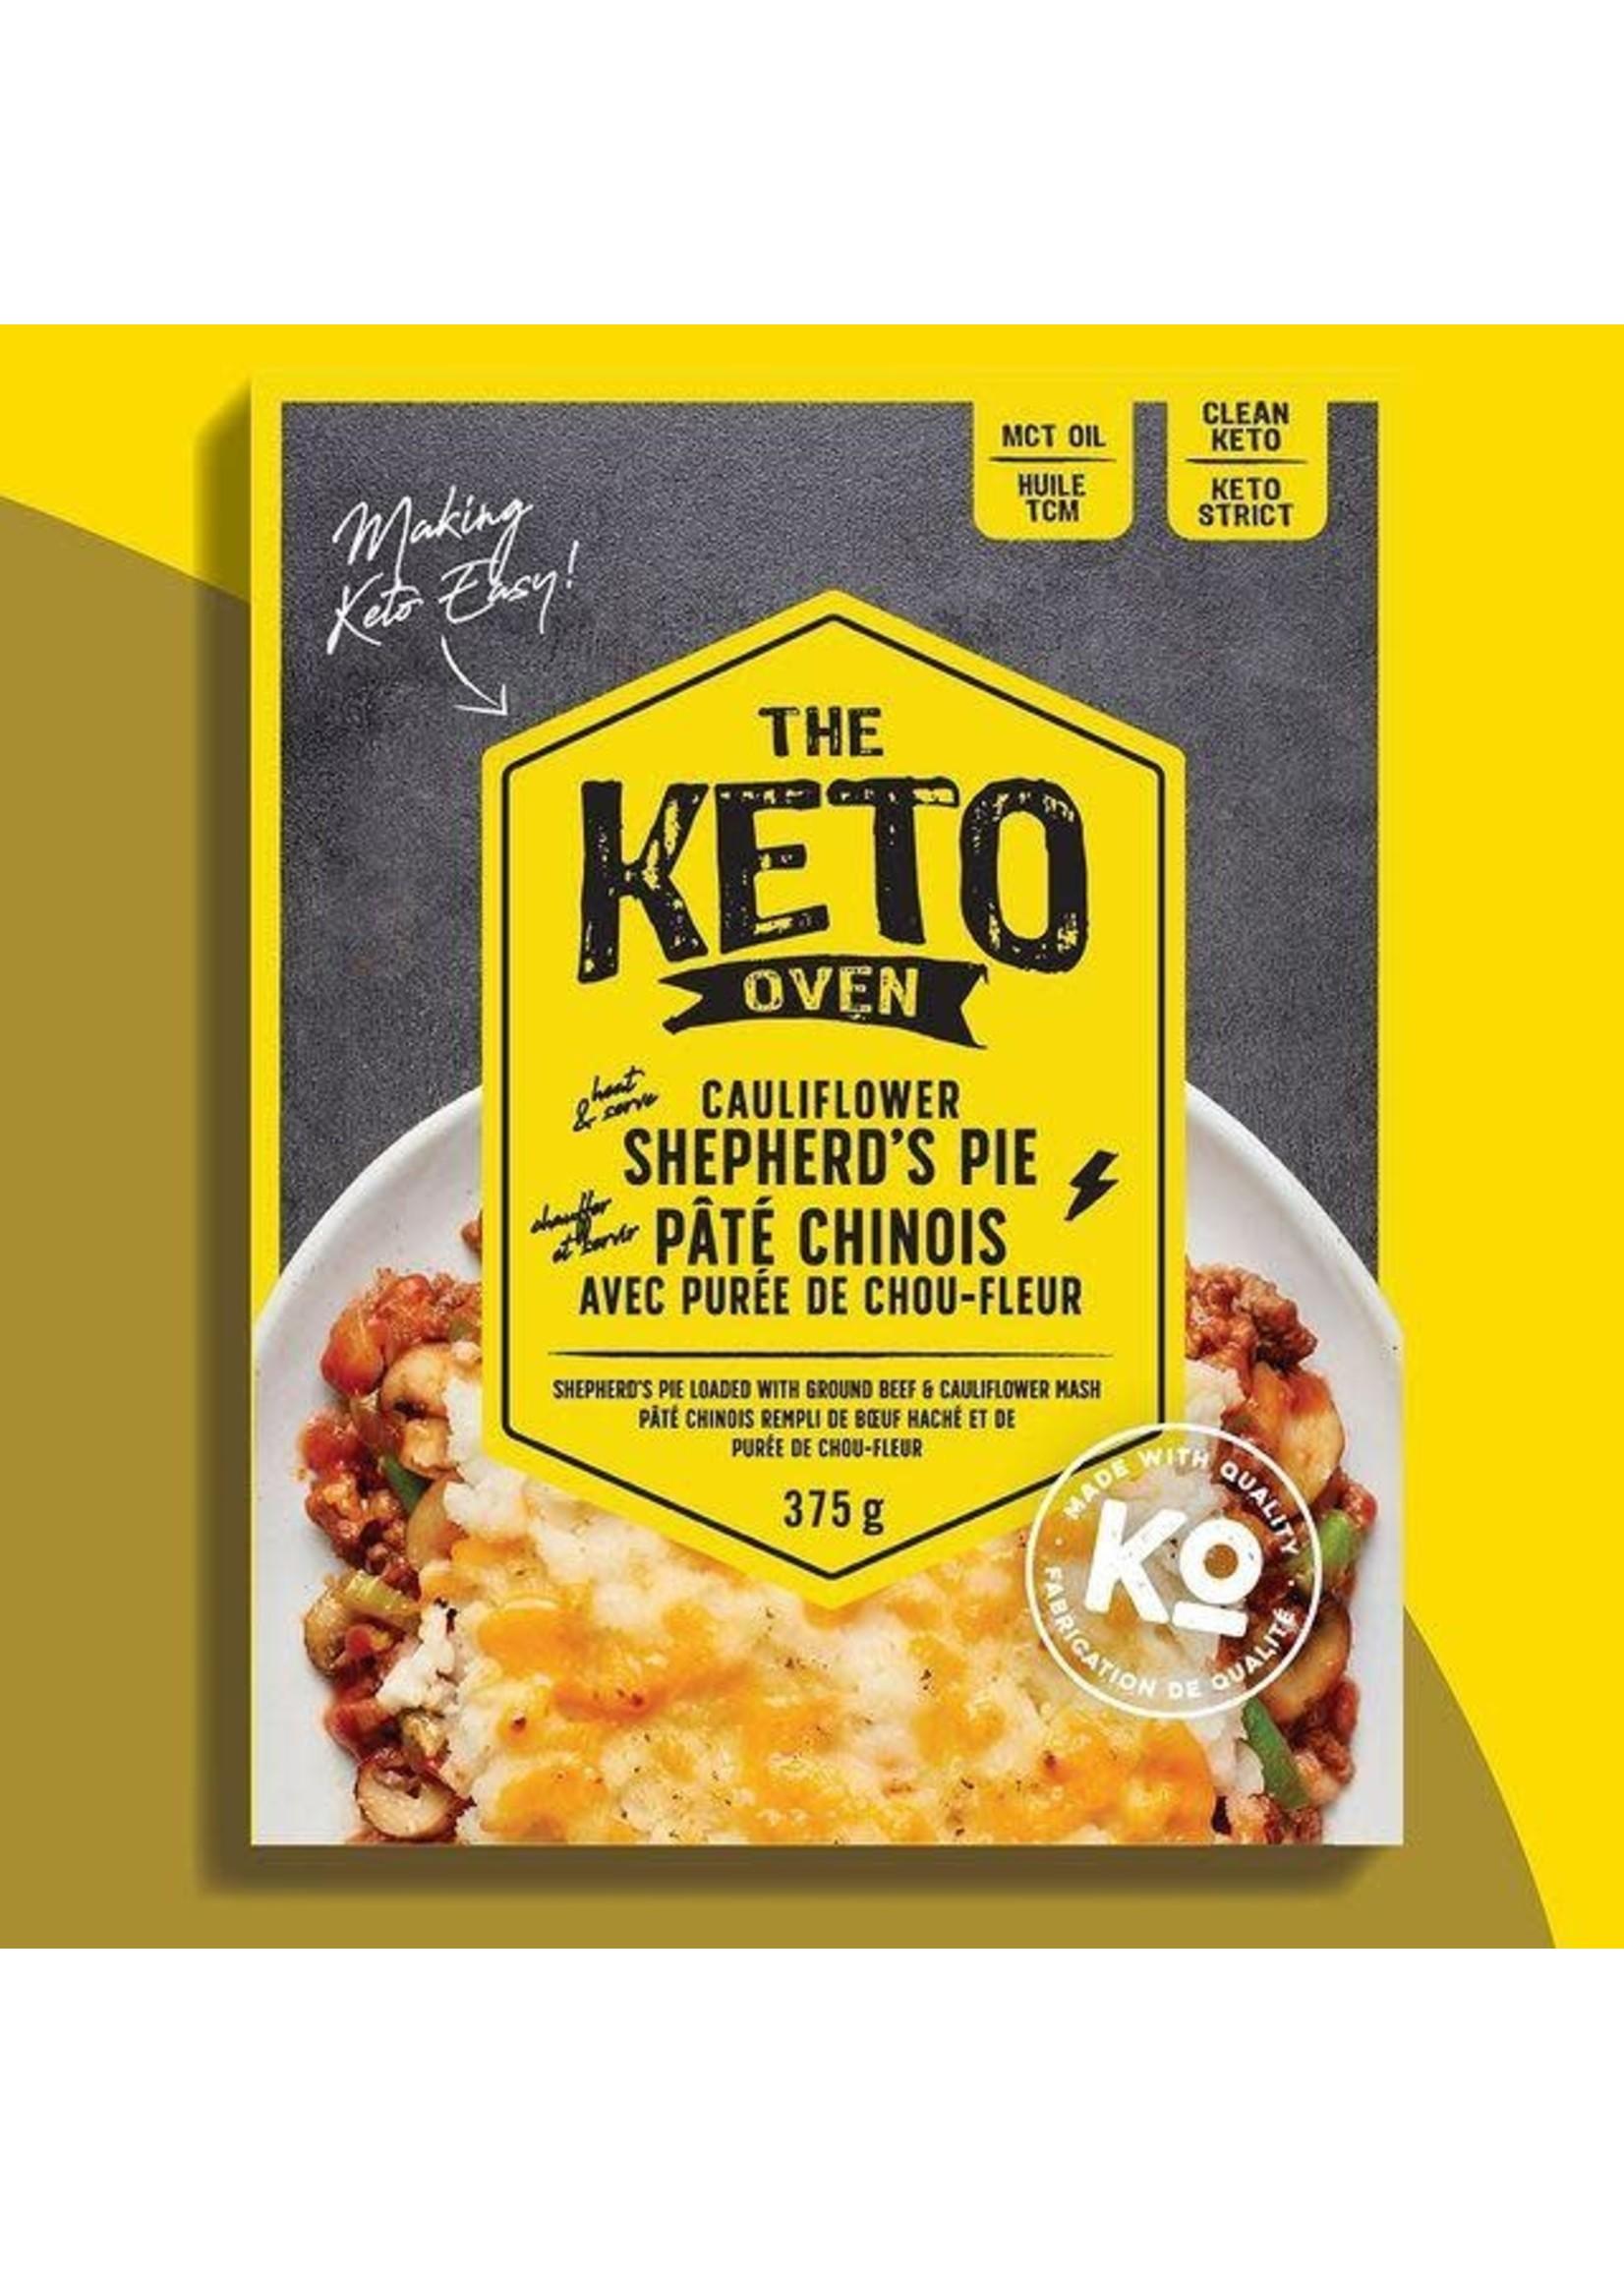 The Keto Kitchen The Keto Oven- Shepherd's pie